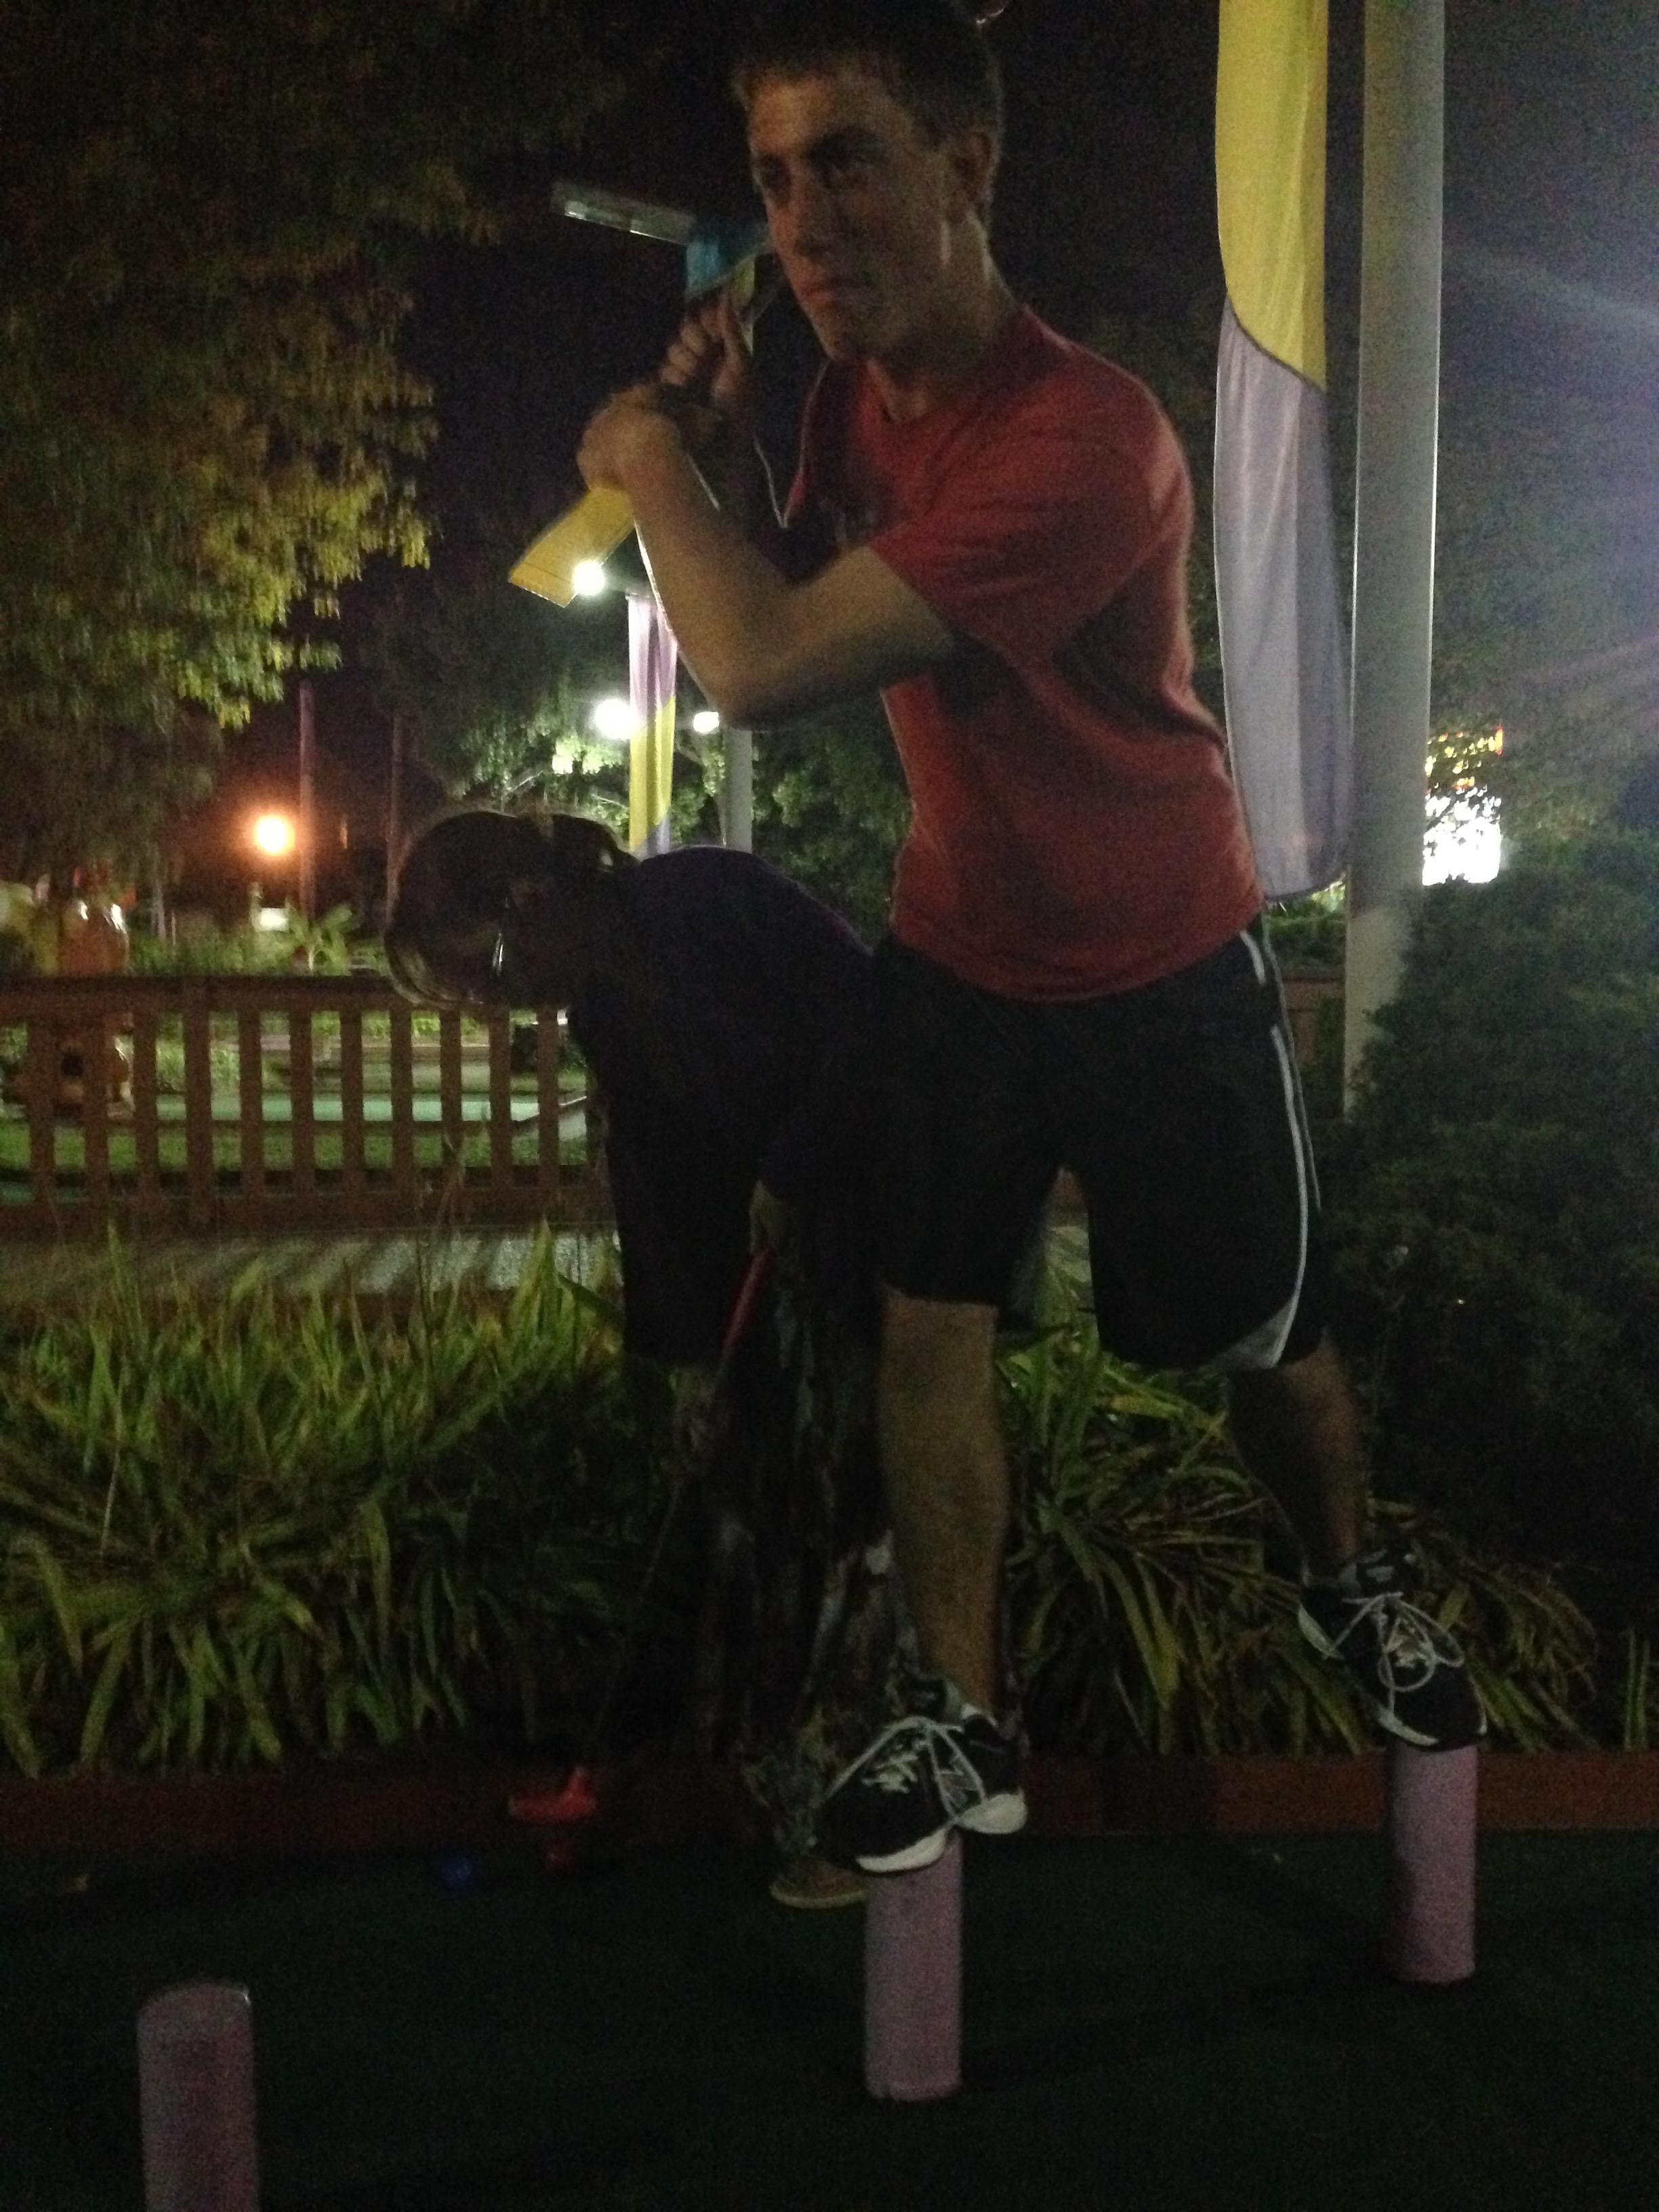 Gavin at Mini-Golf Extravaganza